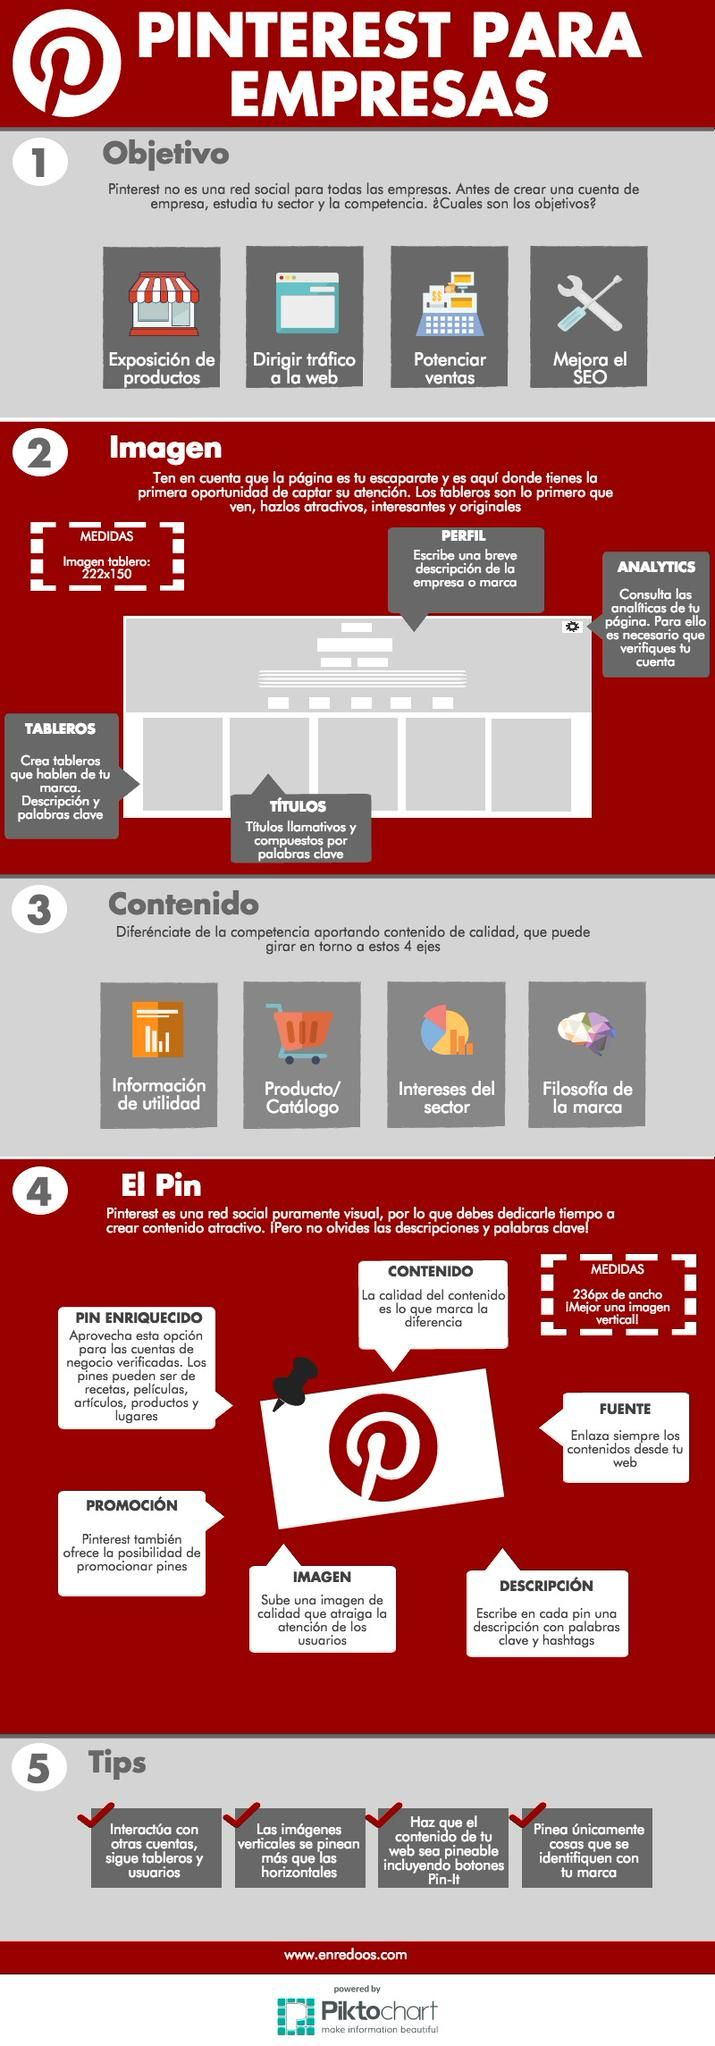 Infografía: Pinterest para empresas vía @EnredoosSM #infografia #pinterest #marketing